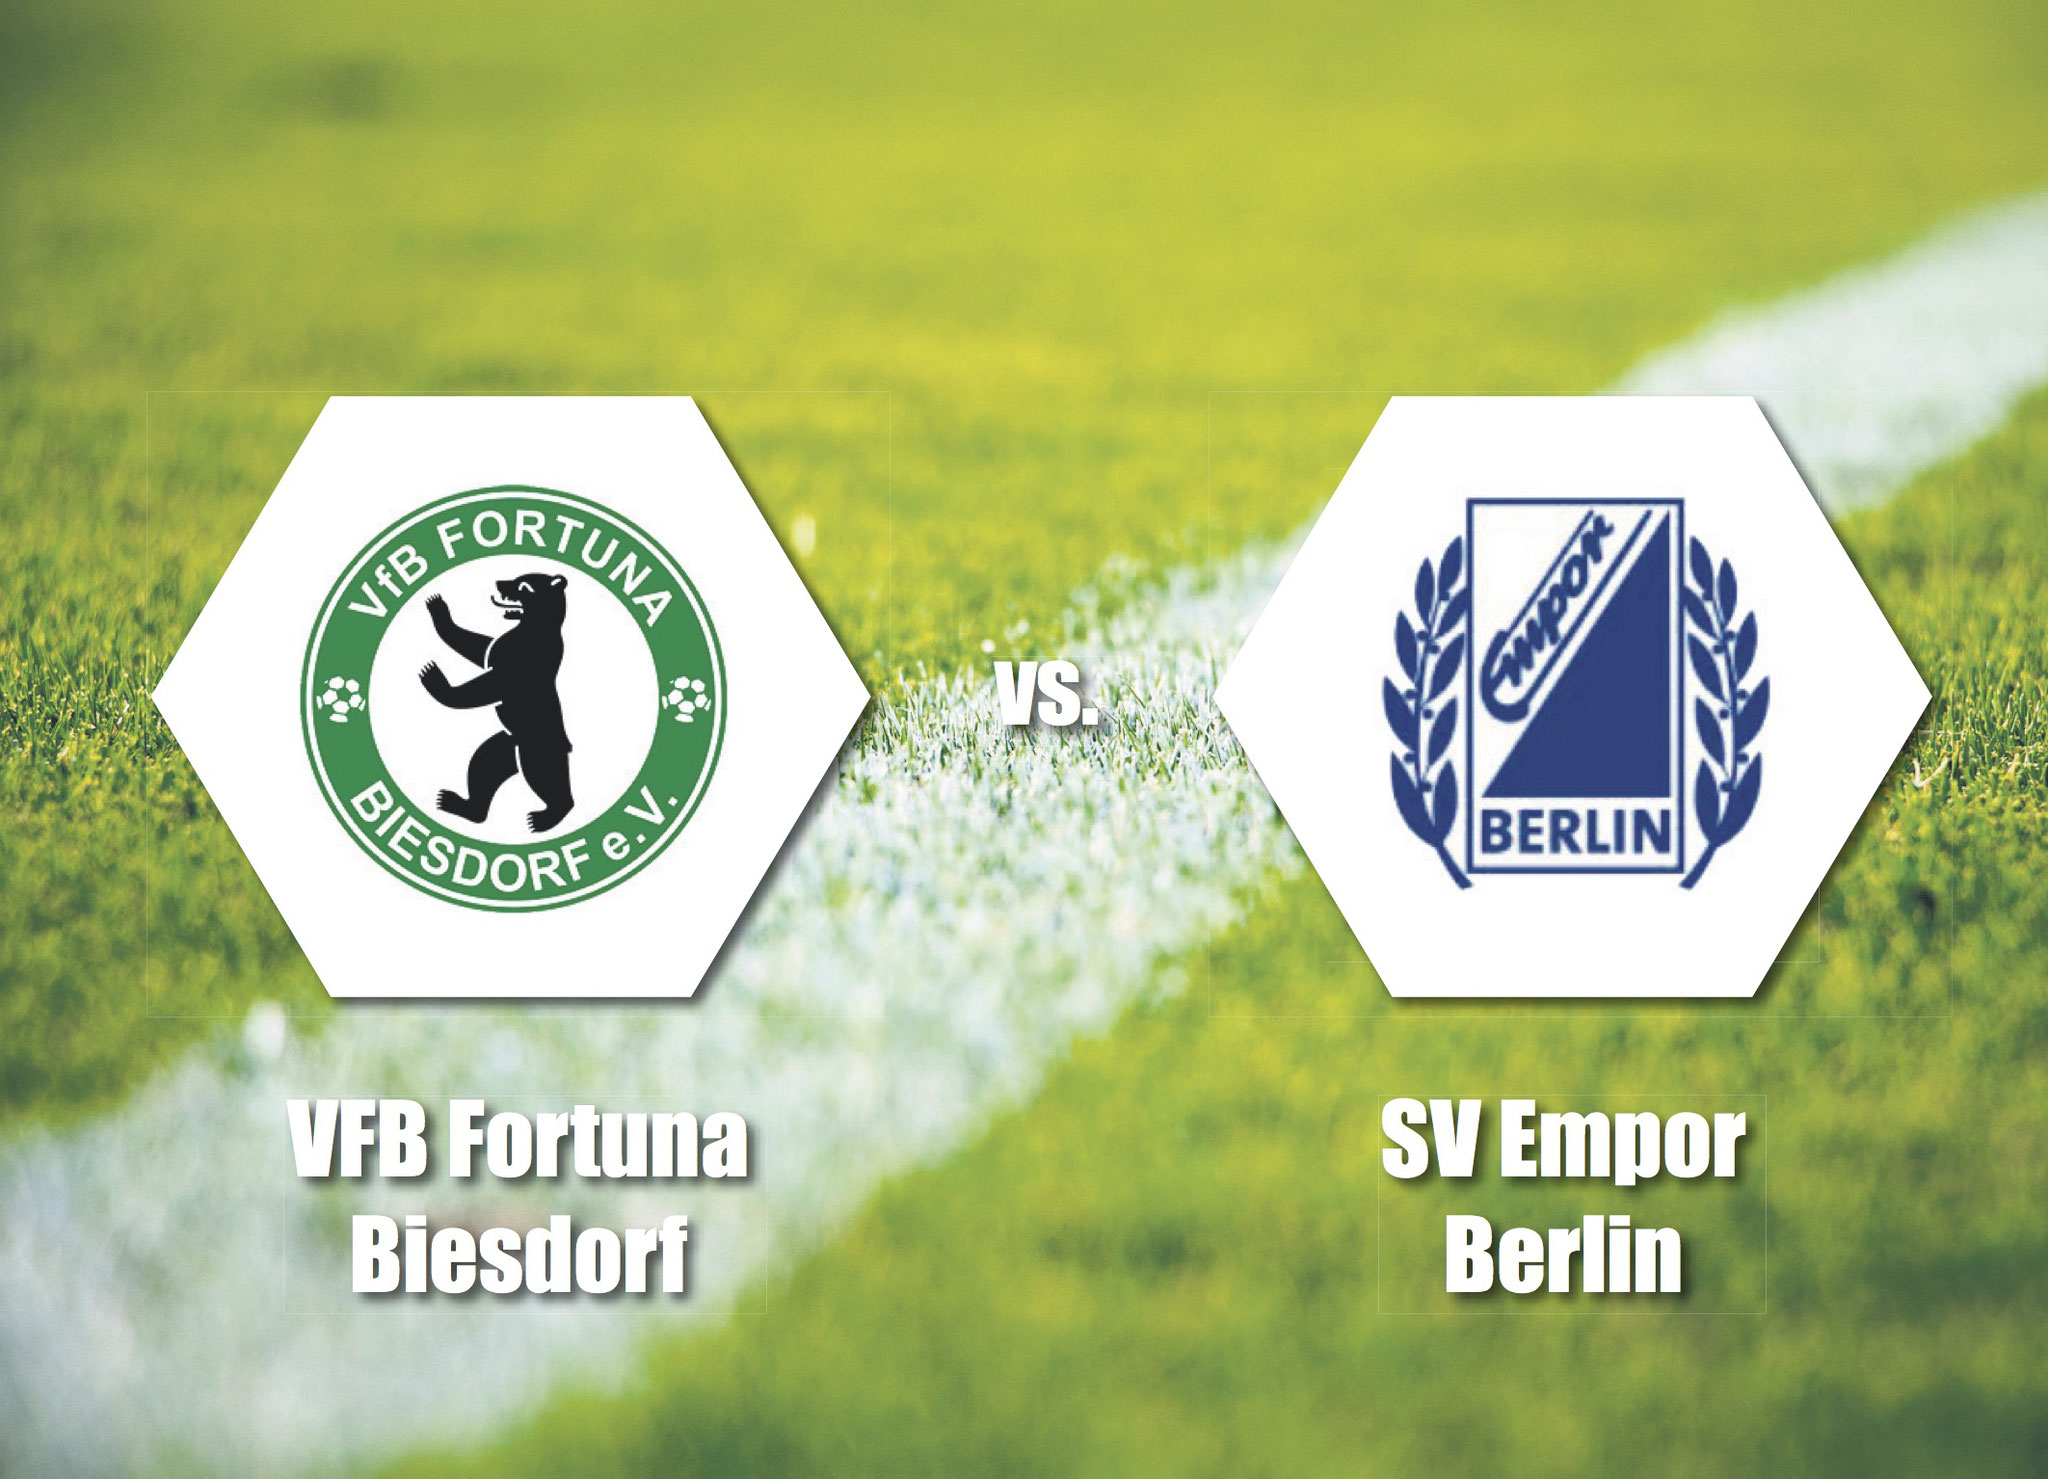 Sa, 15.02., 14 Uhr: Fortuna Biesdorf empfängt in der Berlin-Liga den SV Empor Berlin. Ort: Grabensprung, 12683 Berlin